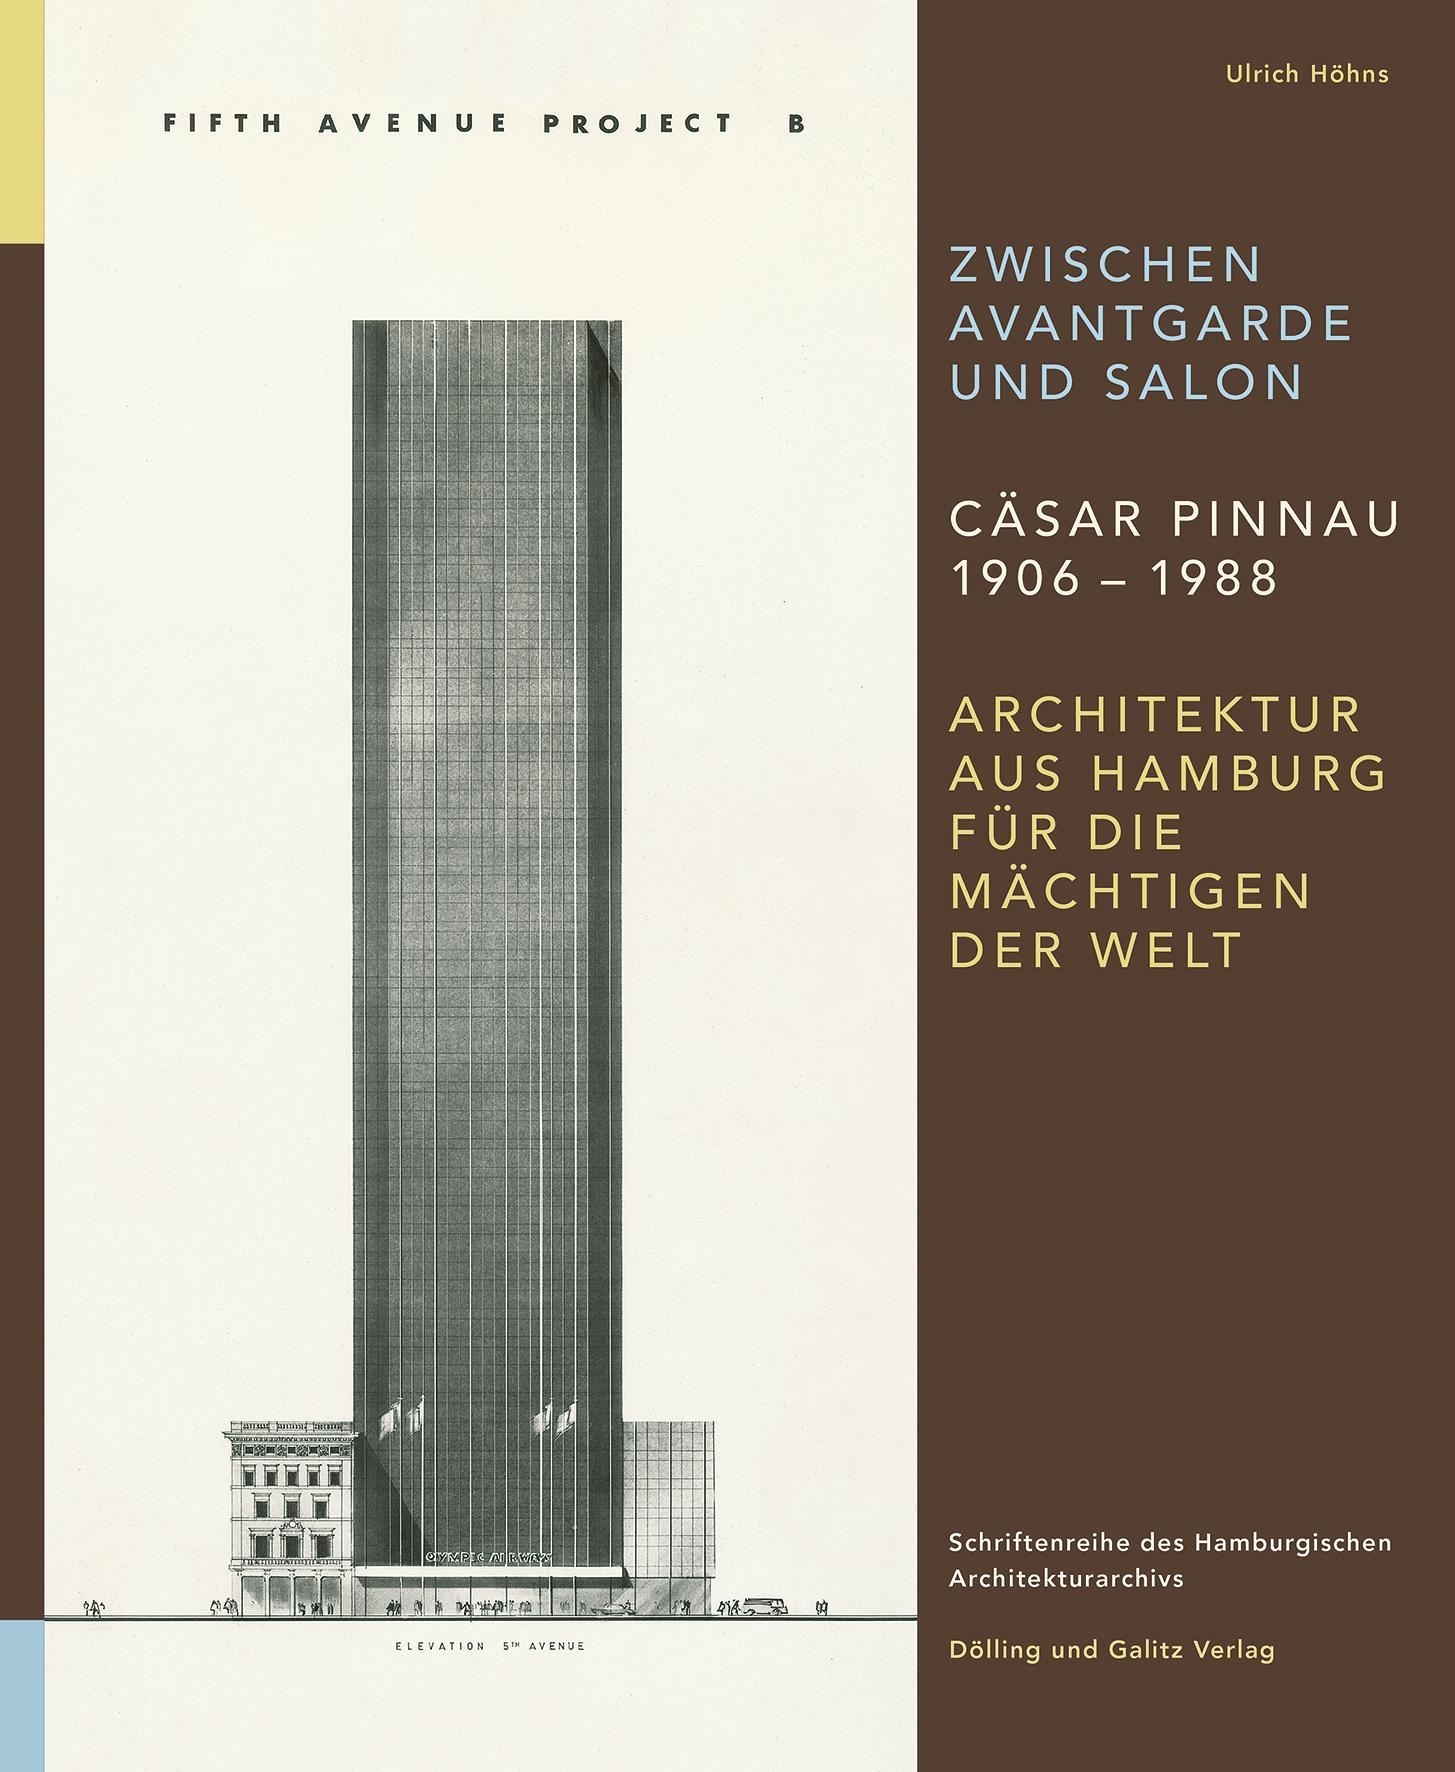 Gesamtwerk Architektur dölling und galitz verlag dugverlag de